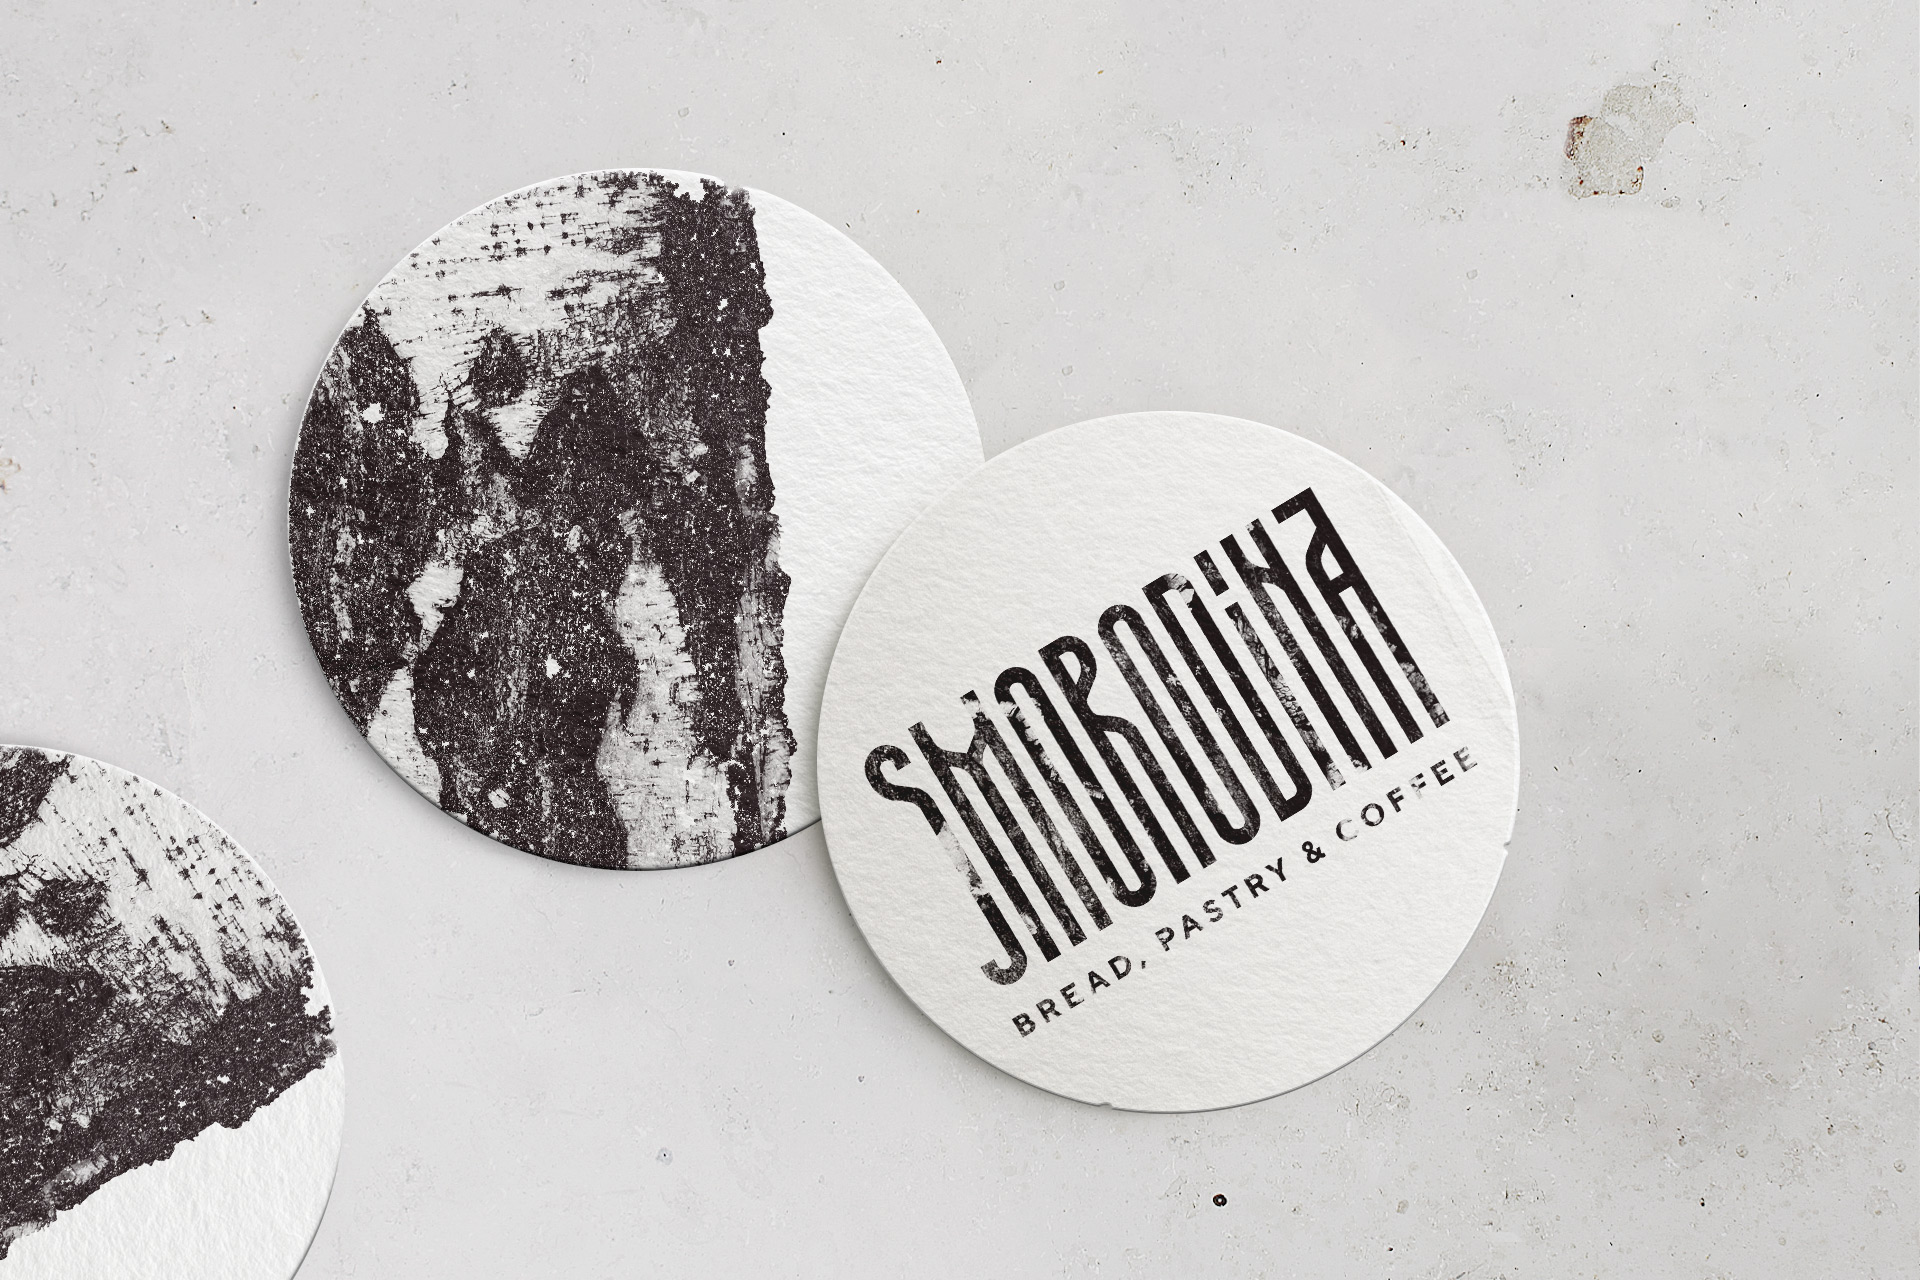 SMO-001-coasters